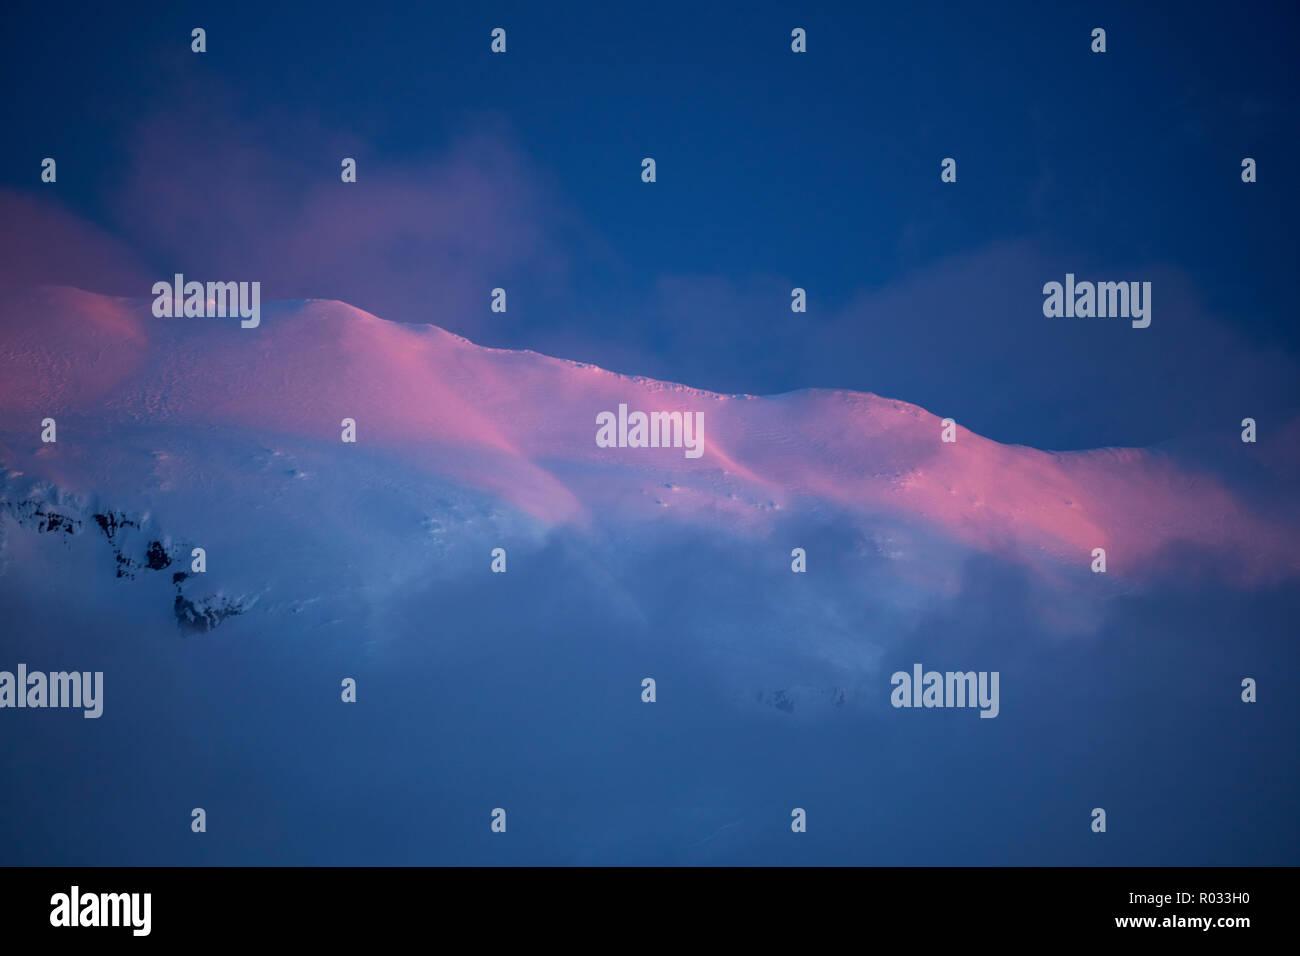 Alpenglow on Mt Ruapehu at dusk, Tongariro National Park, Central Plateau, North Island, New Zealand - Stock Image